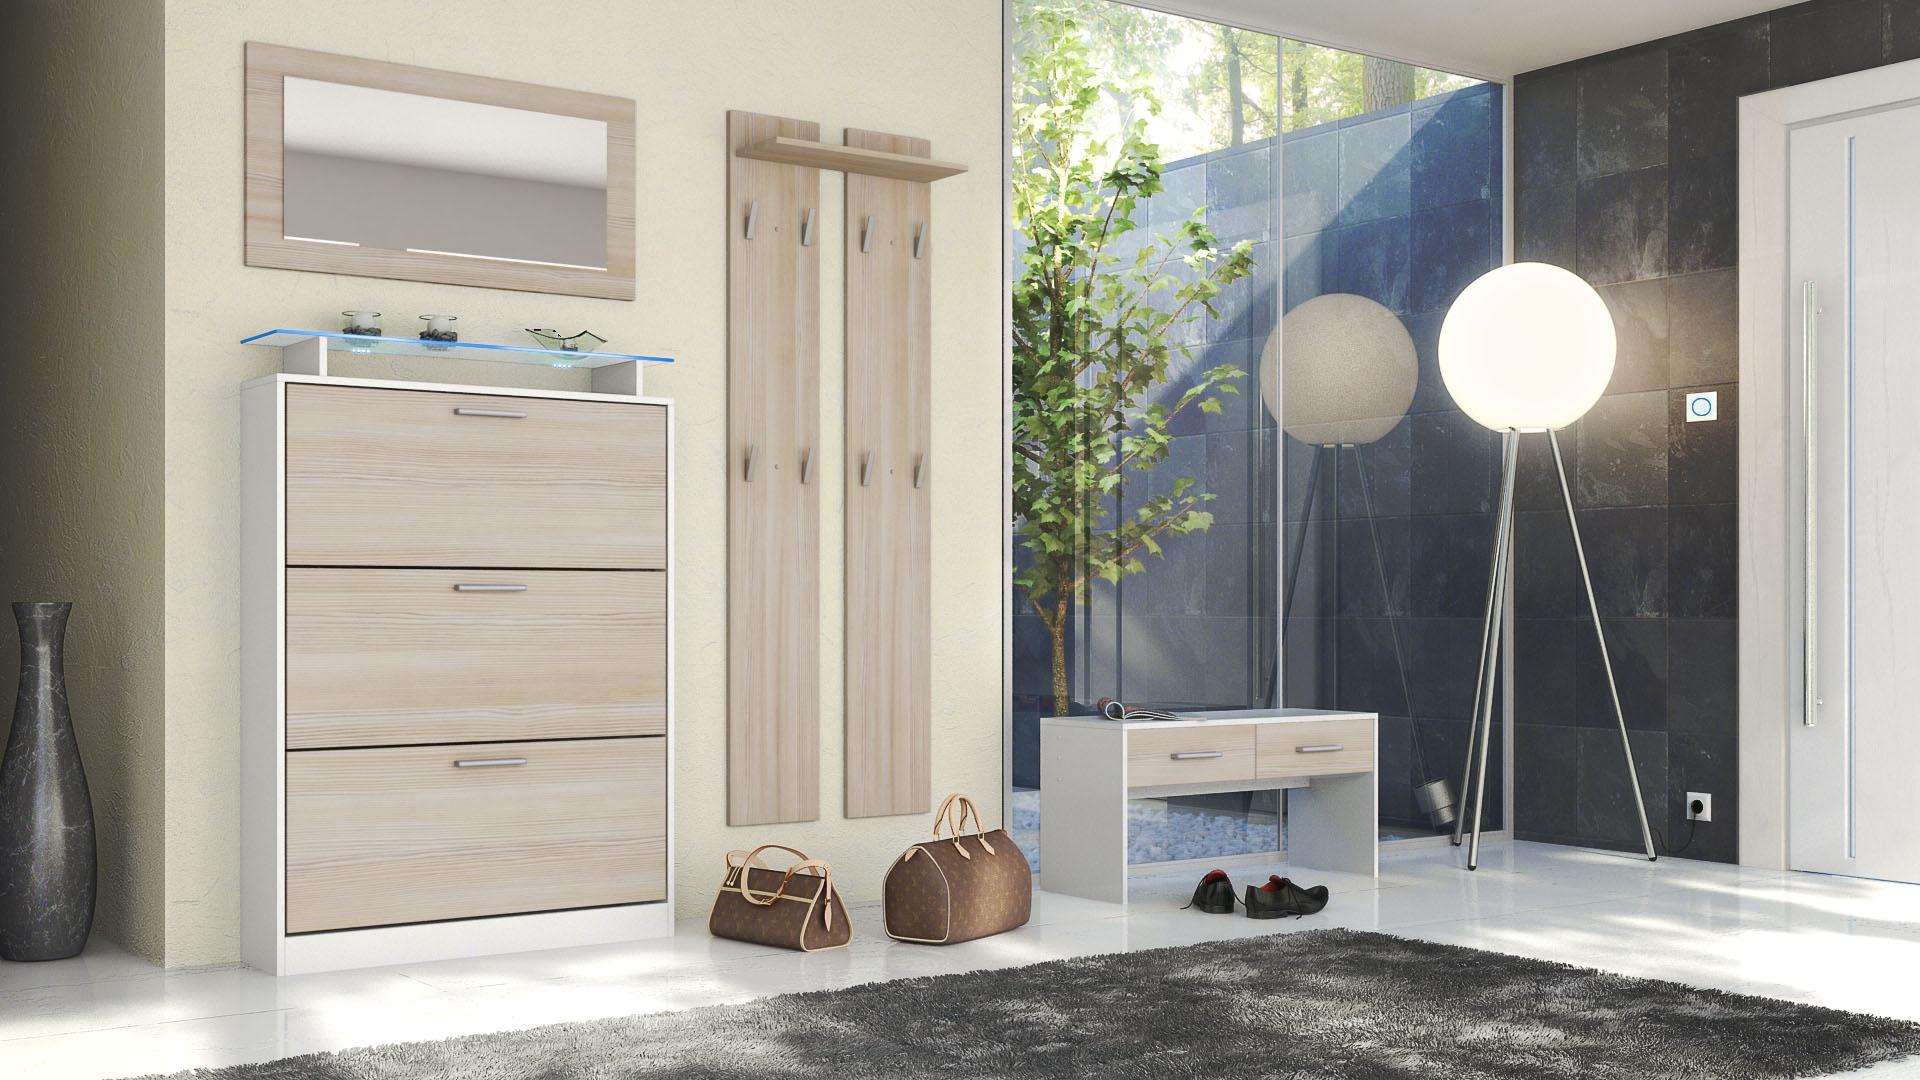 garderobenset flur garderobe diele lavia in wei. Black Bedroom Furniture Sets. Home Design Ideas